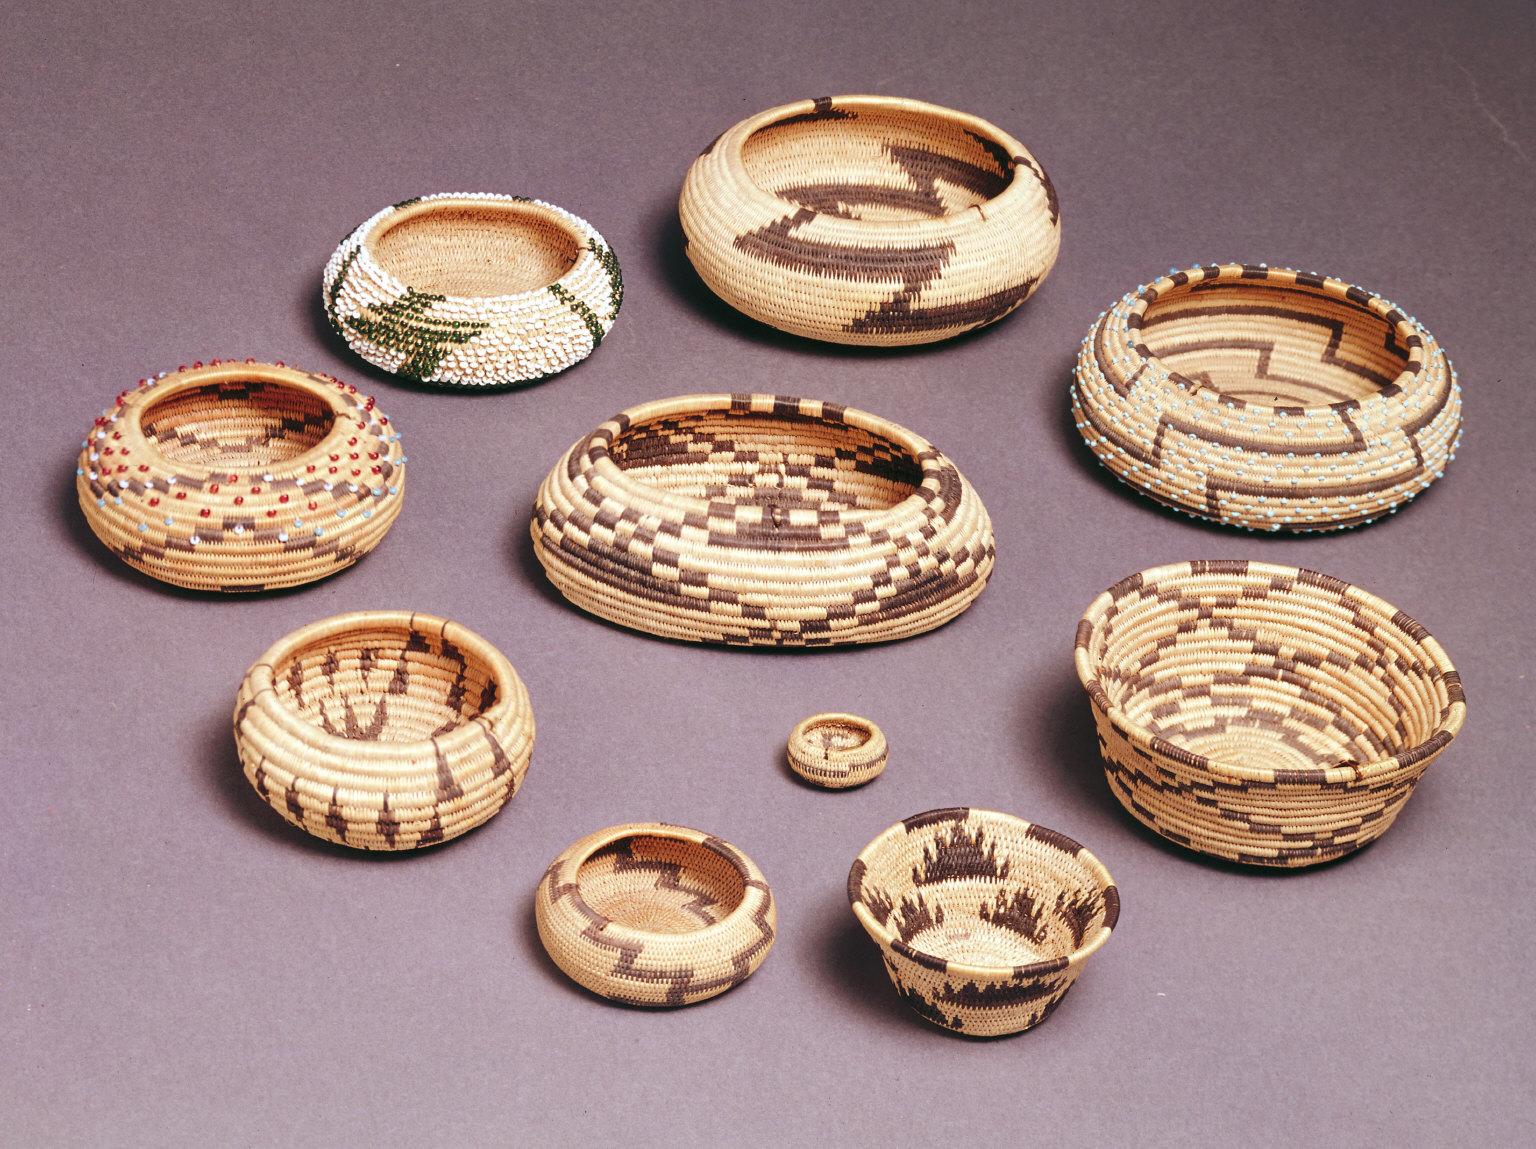 Basket with three miniature baskets inside